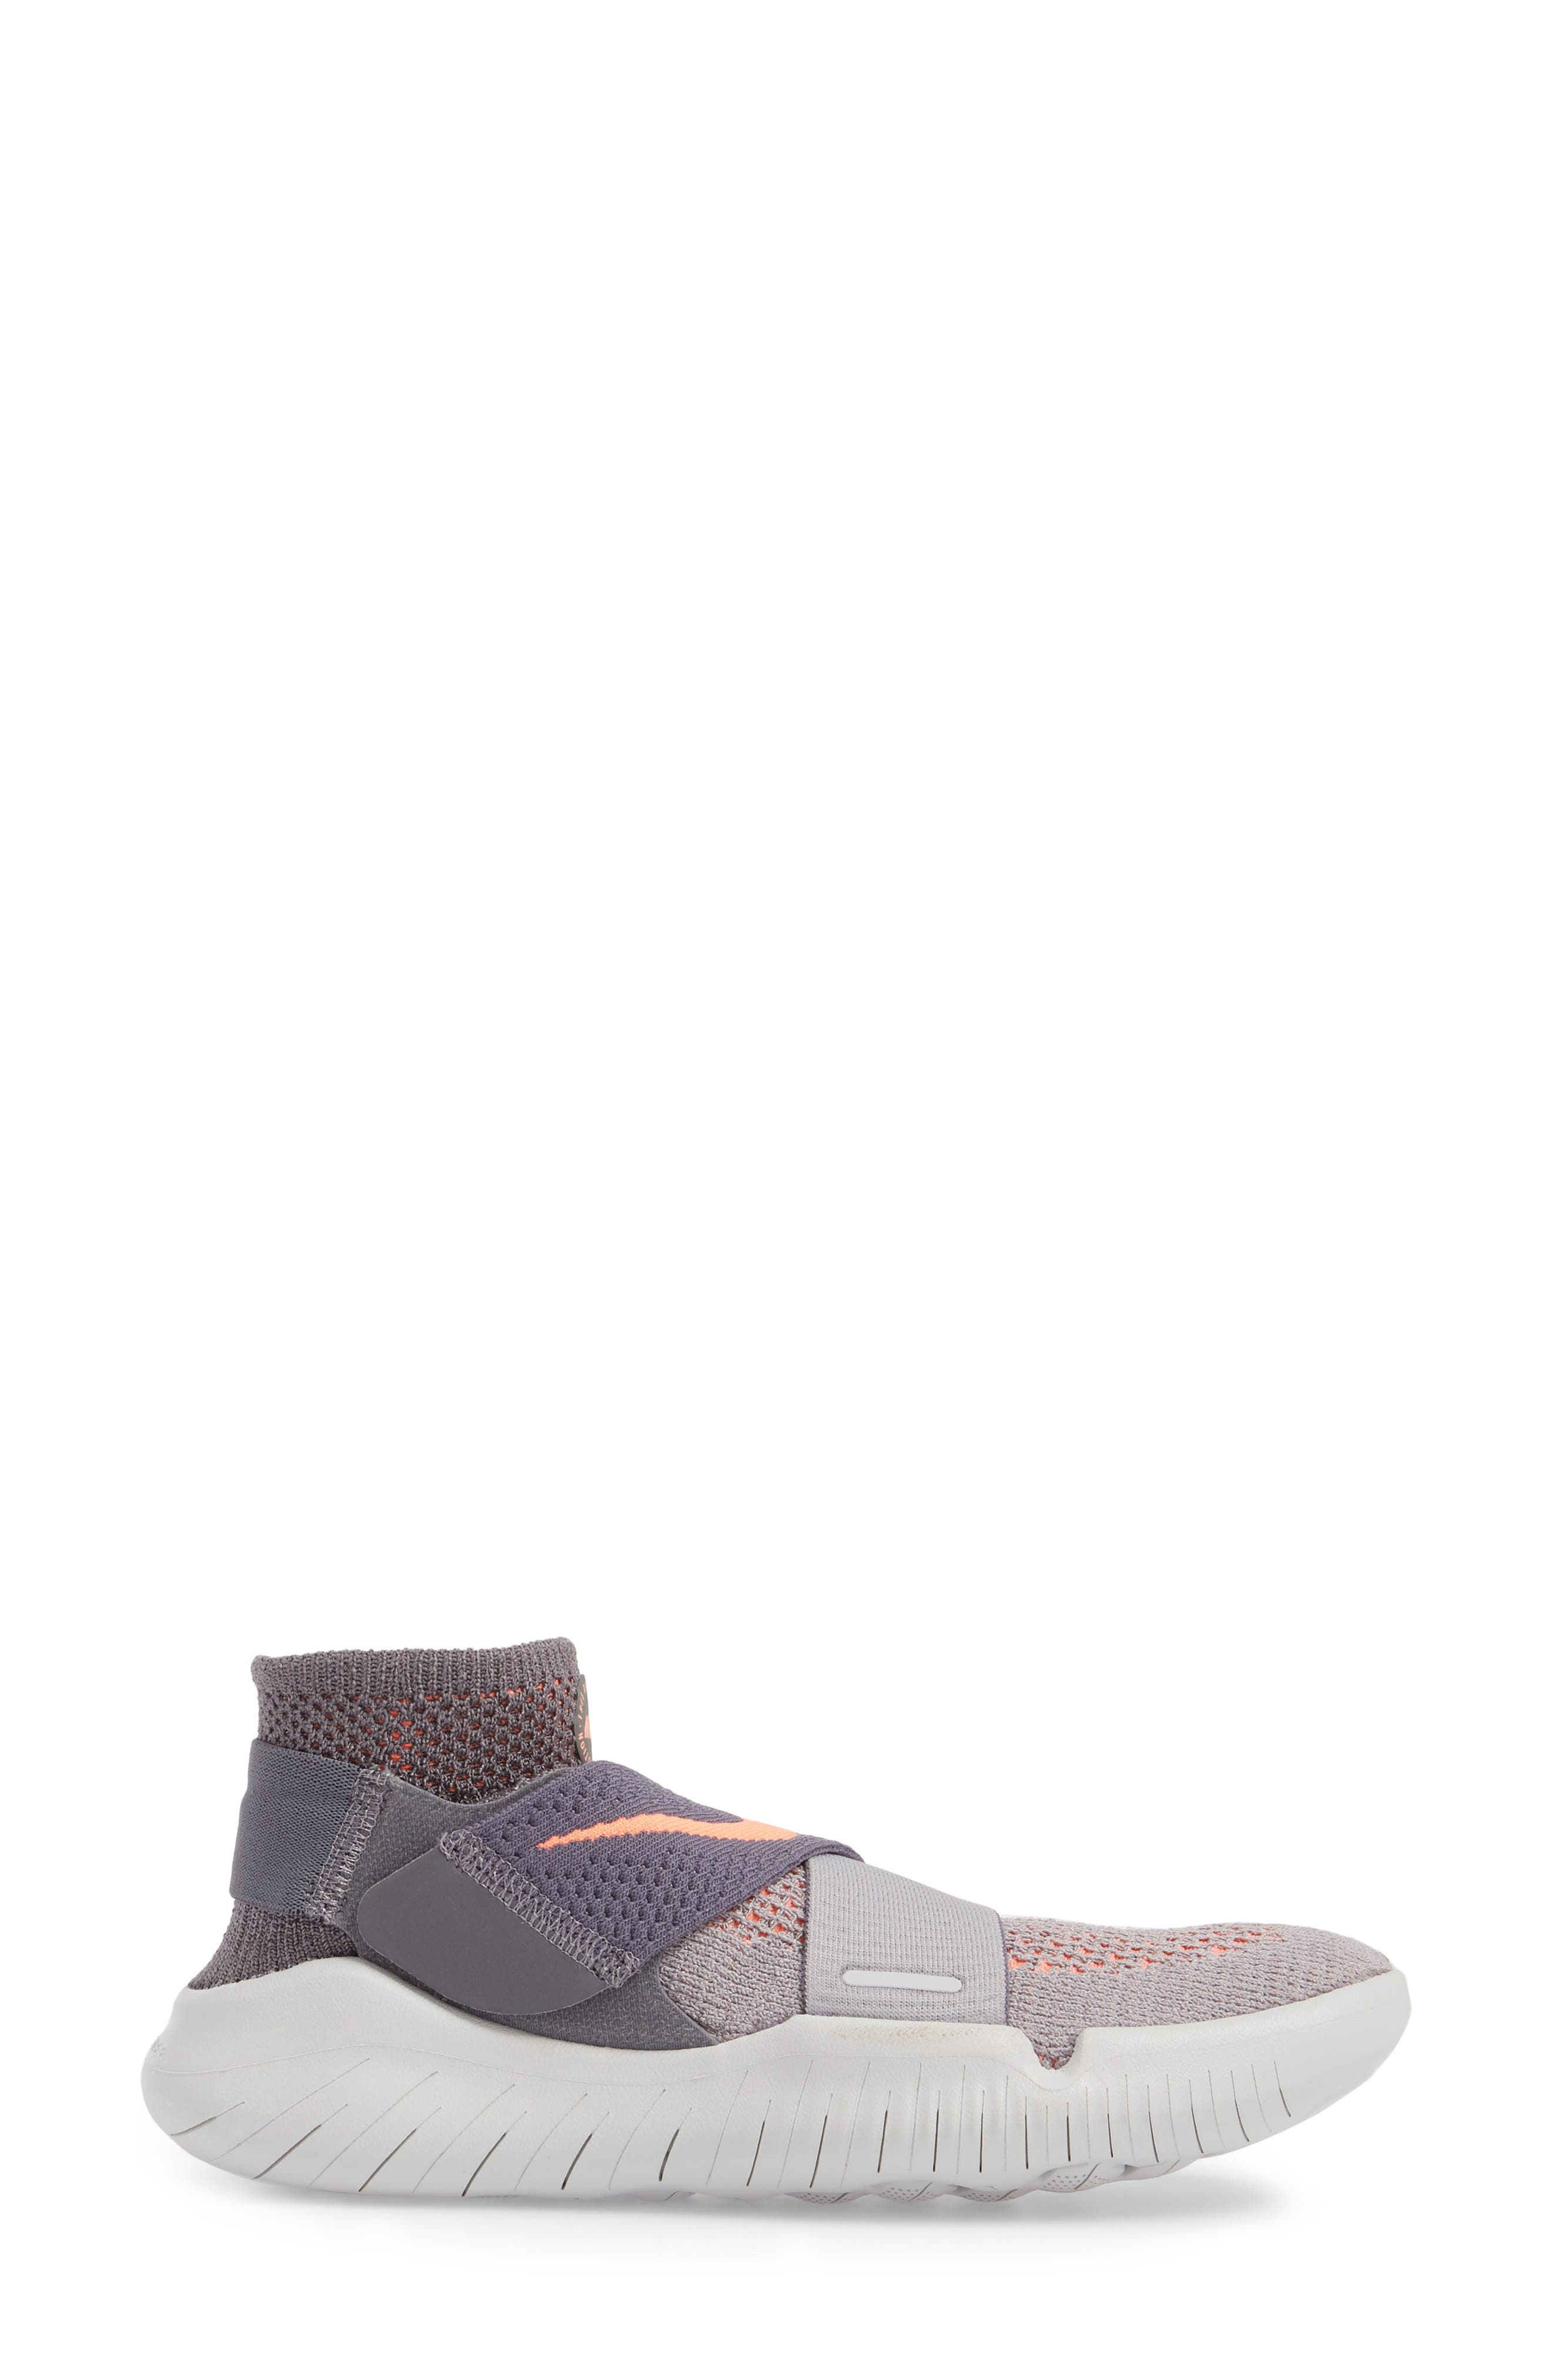 Free RN Motion Flyknit 2018 Running Shoe,                             Alternate thumbnail 3, color,                             023